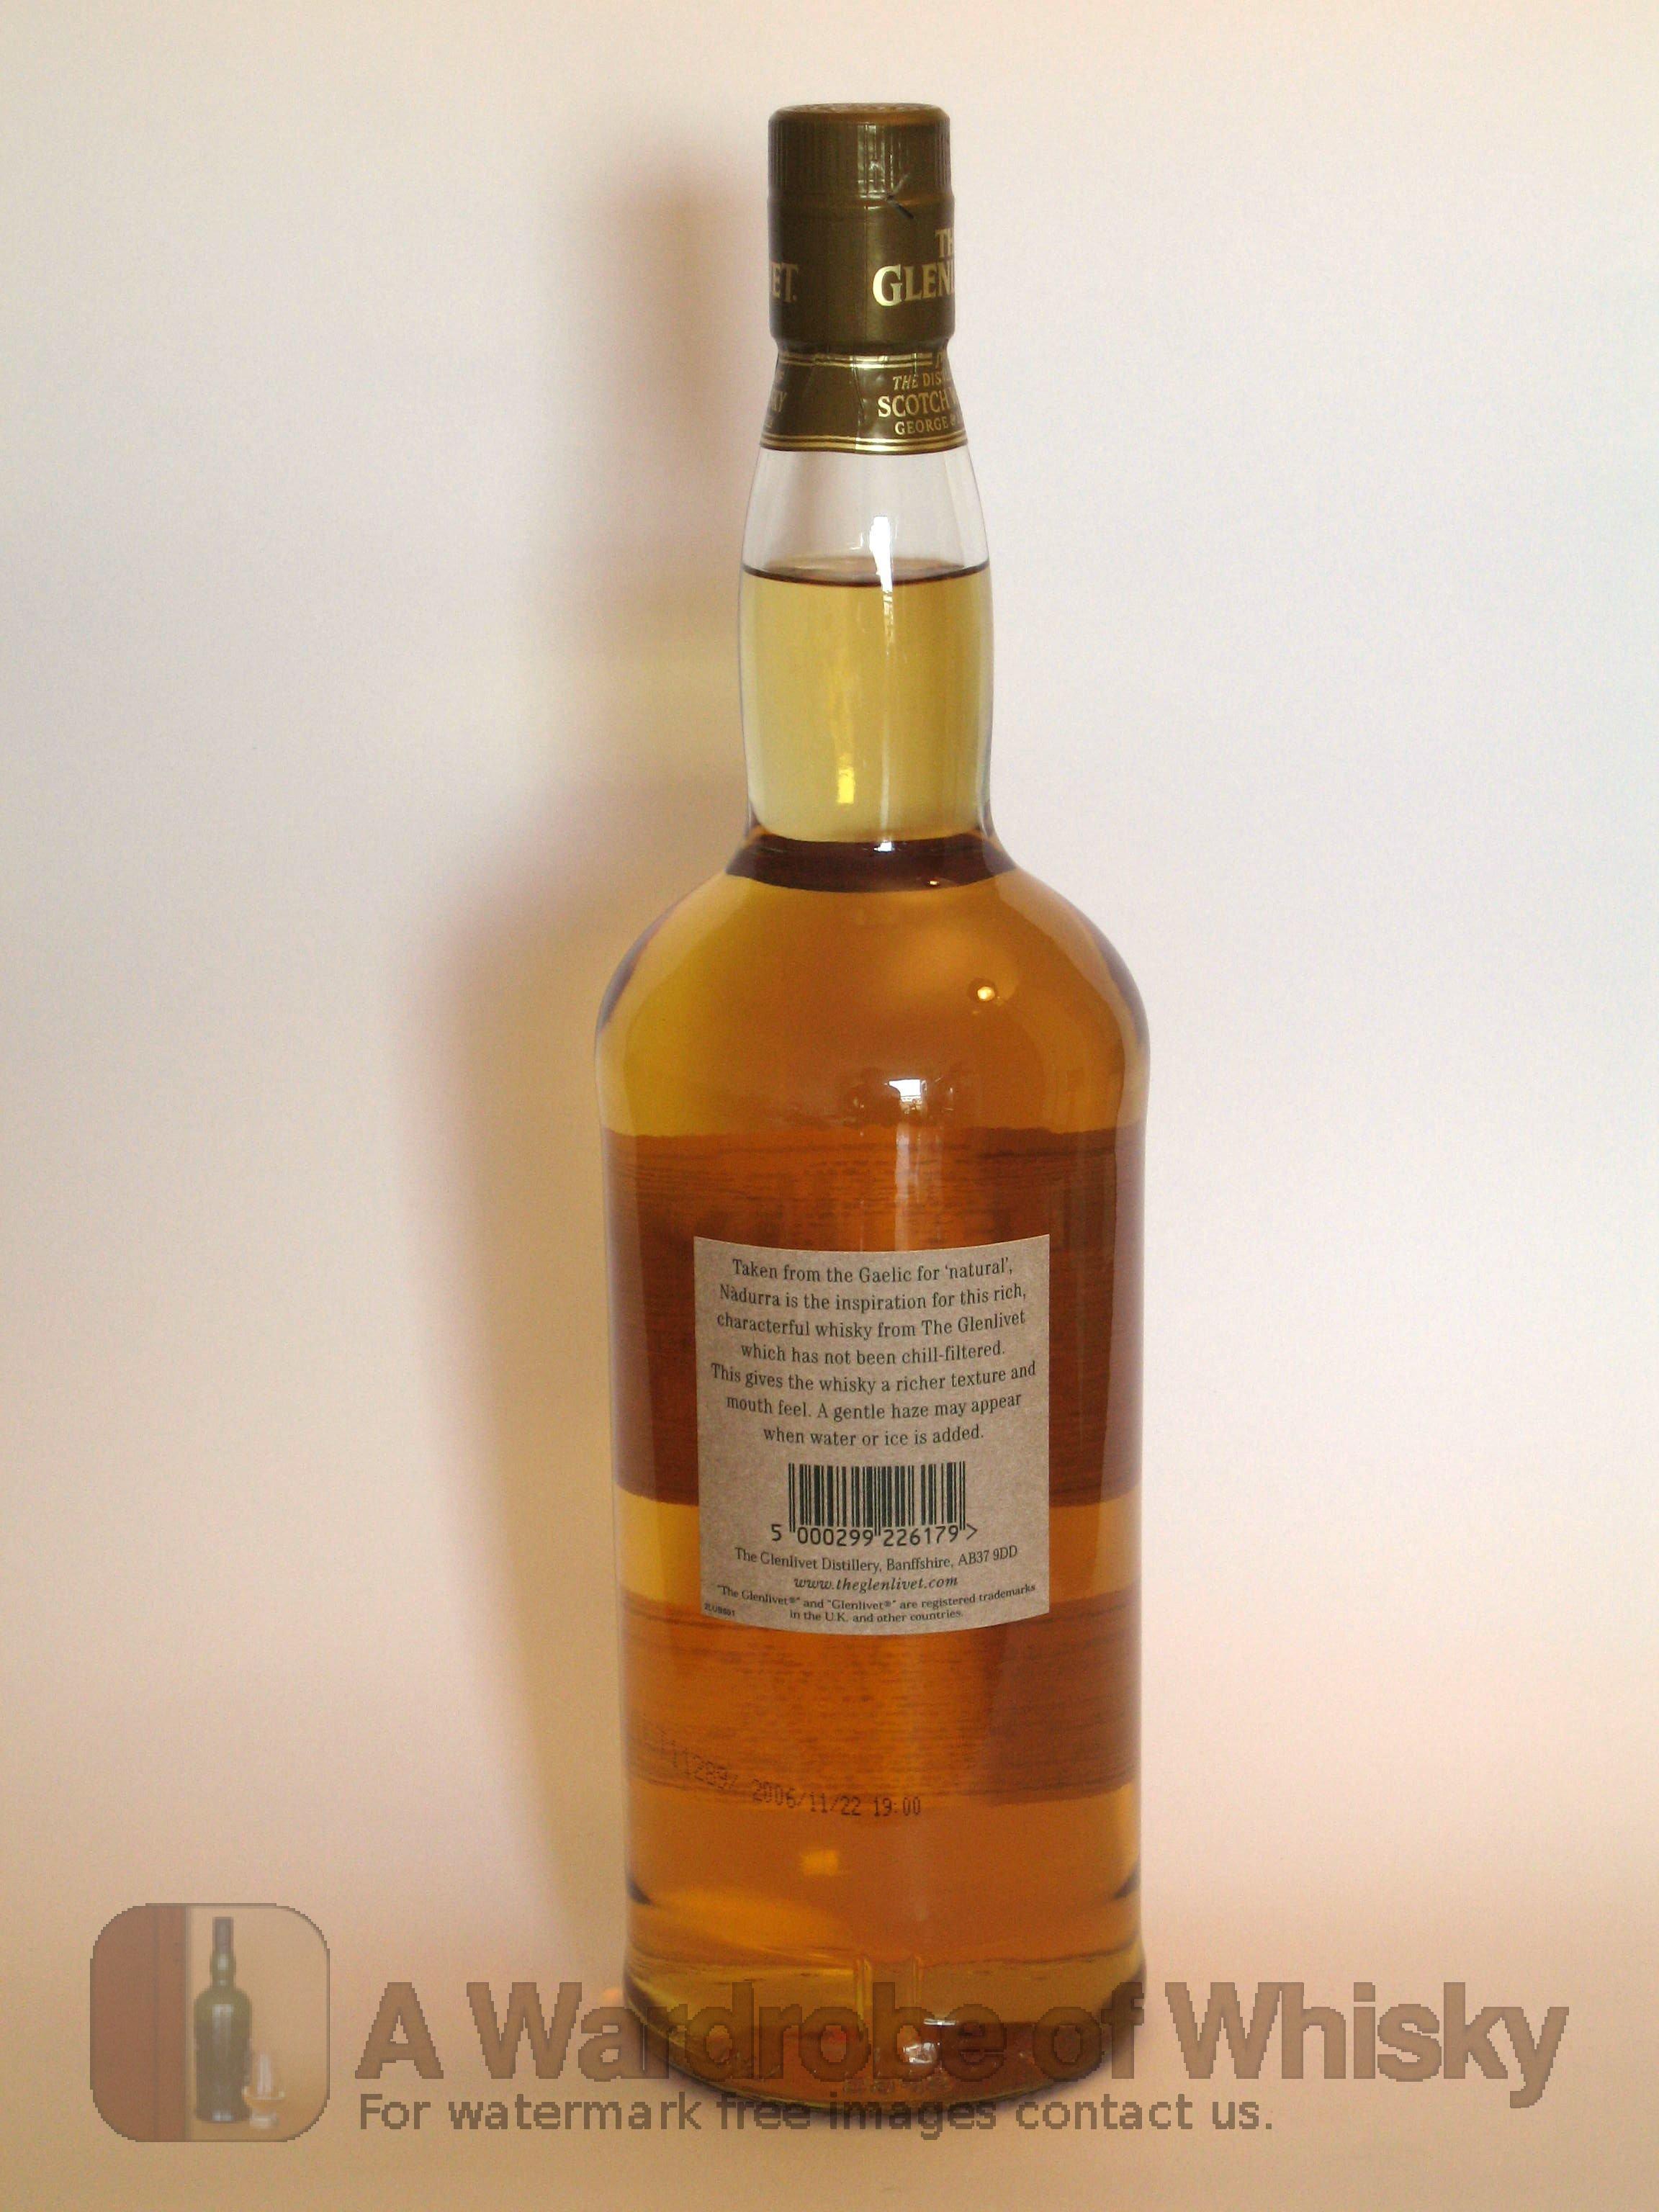 most popular single malt scotch whisky in scotland